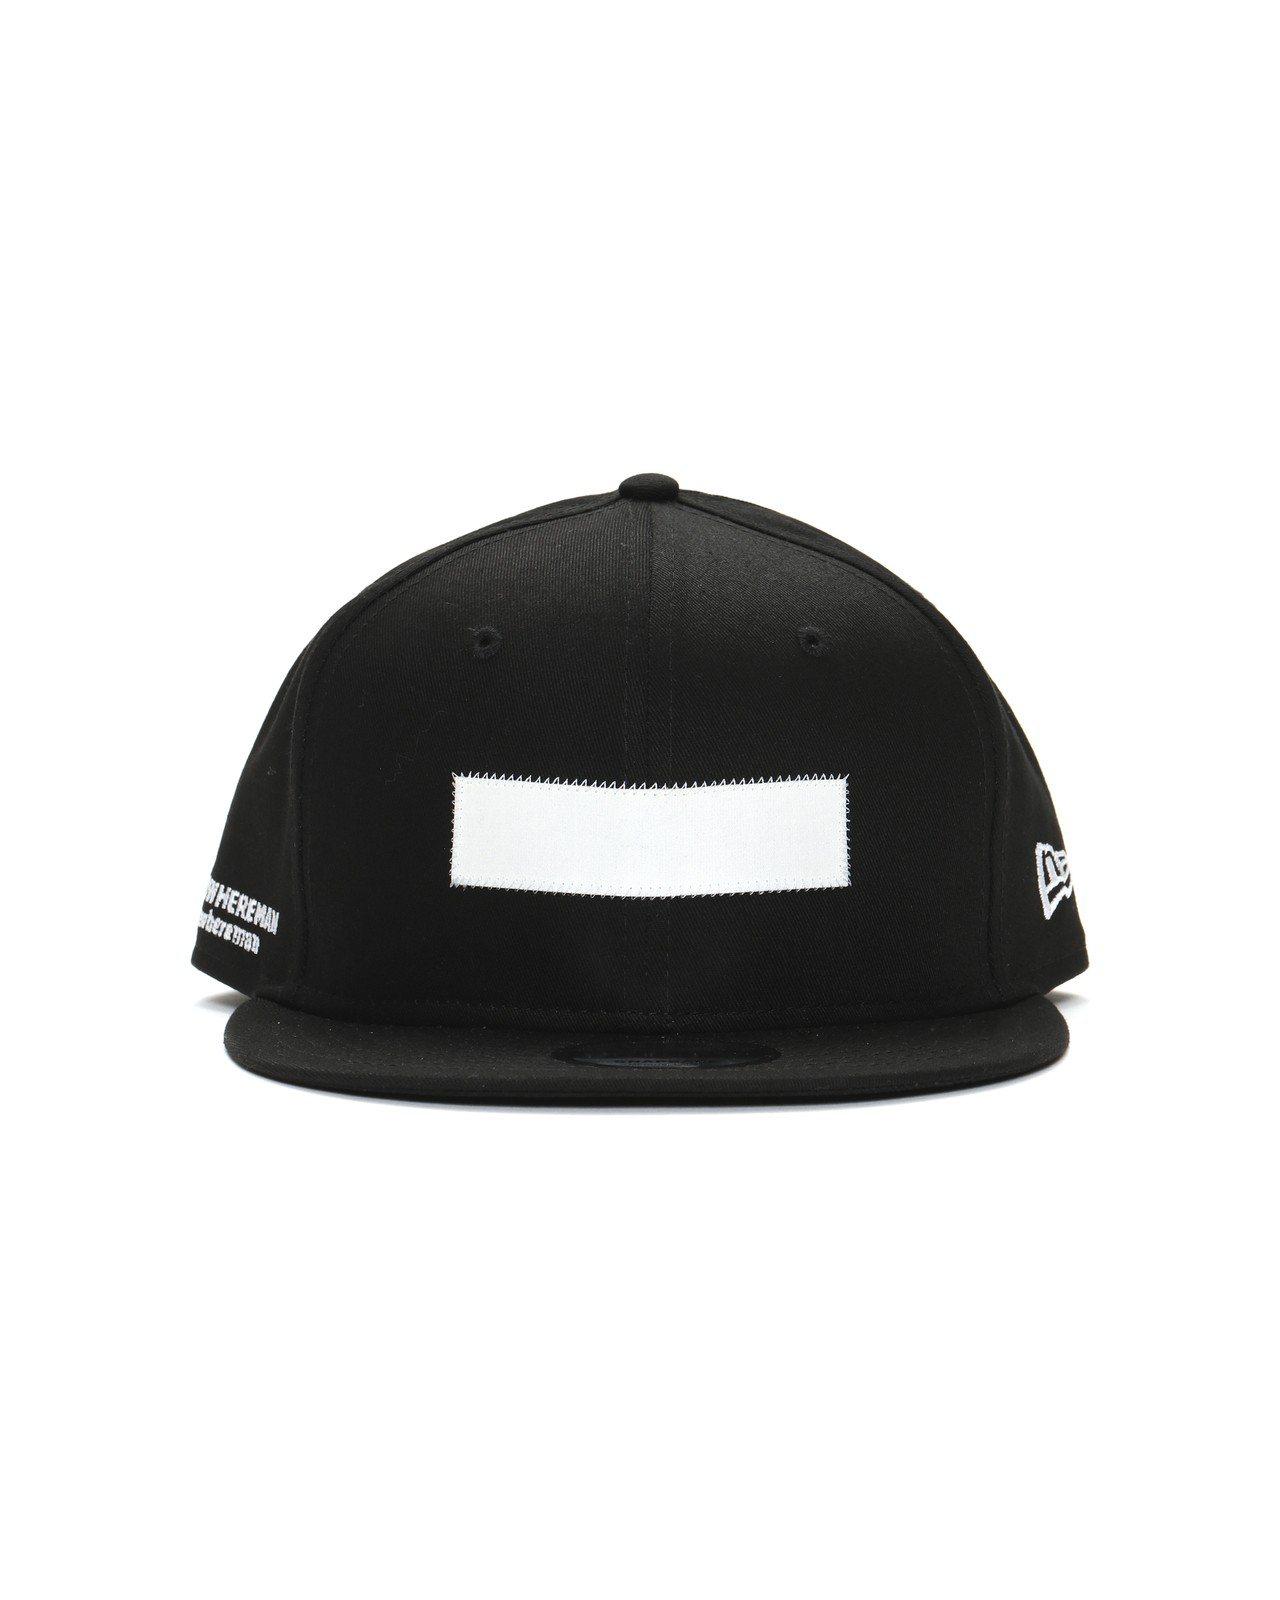 (A)NOWHEREMAN x NEW ERA聯名帽款,9FIFTY Snapb...